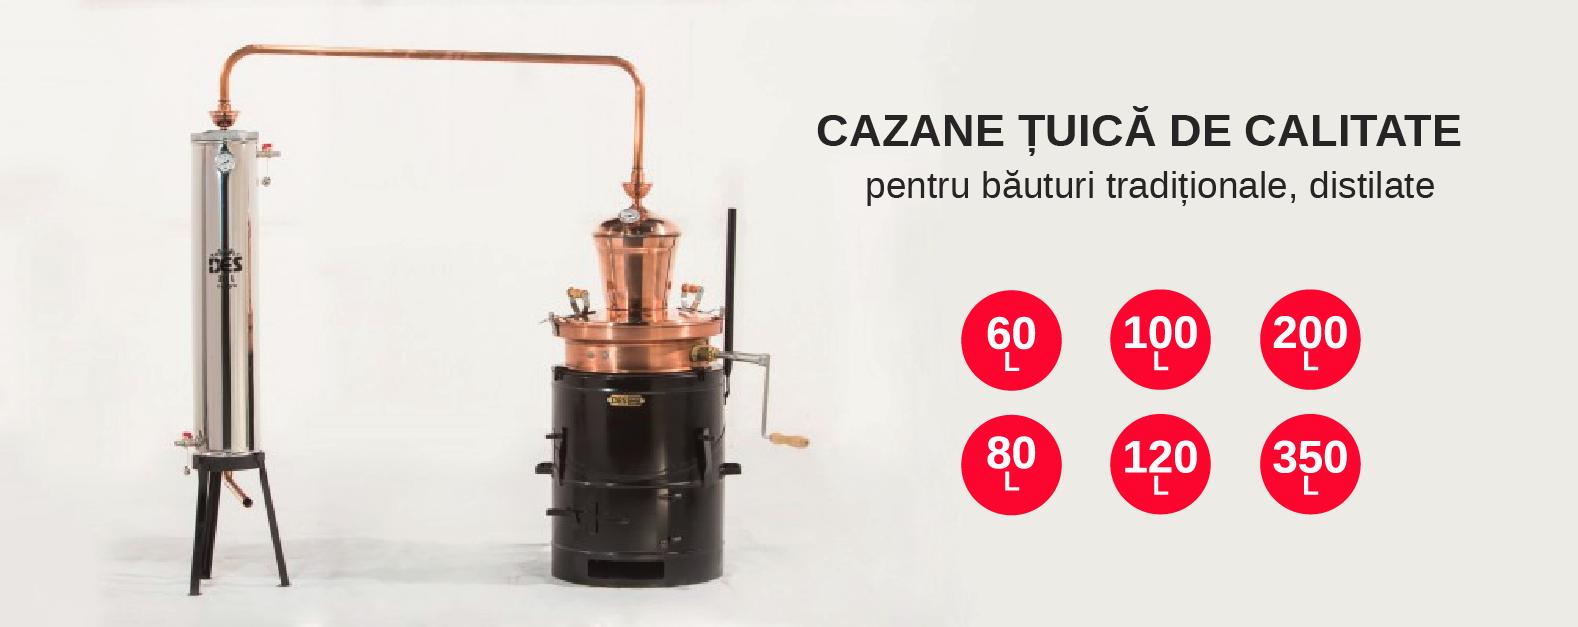 Cazane Tuica - Agroland